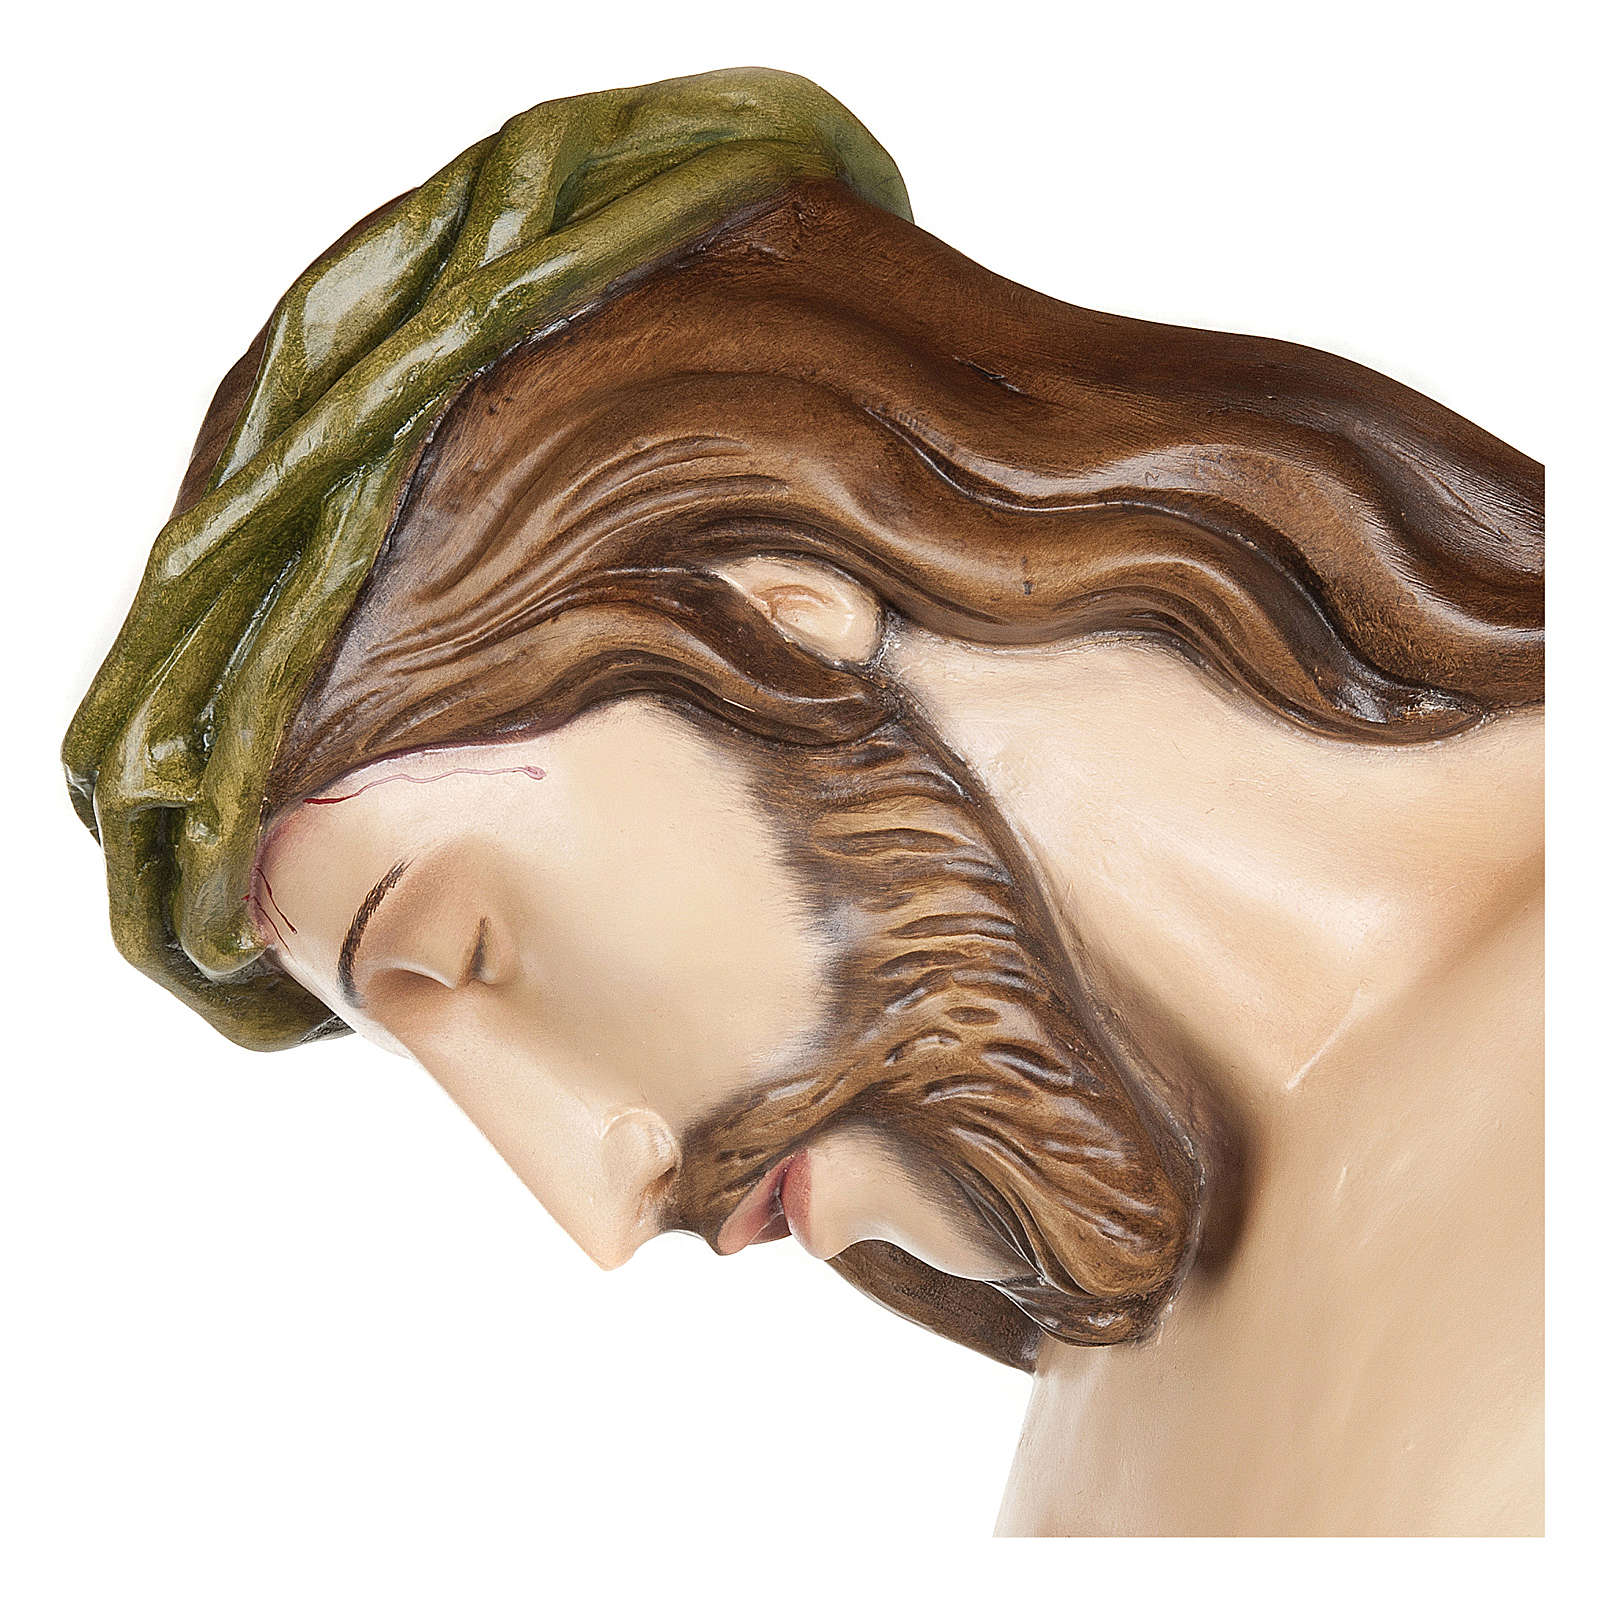 Corpus Christi, fiberglass statue, 150 cm 4